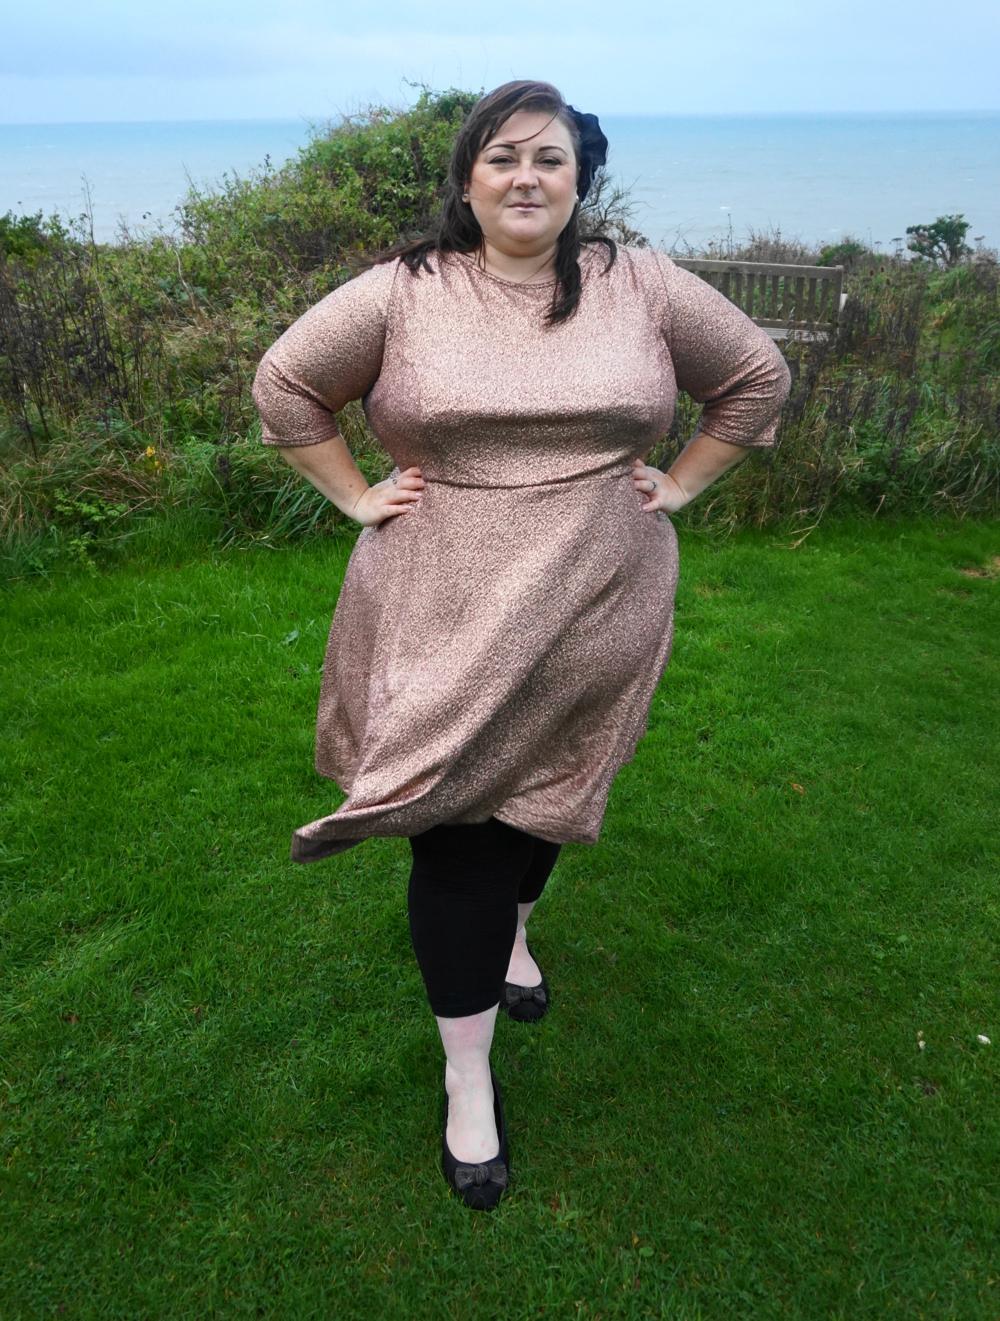 Outfit   Metallic rose gold dress - Love Leah